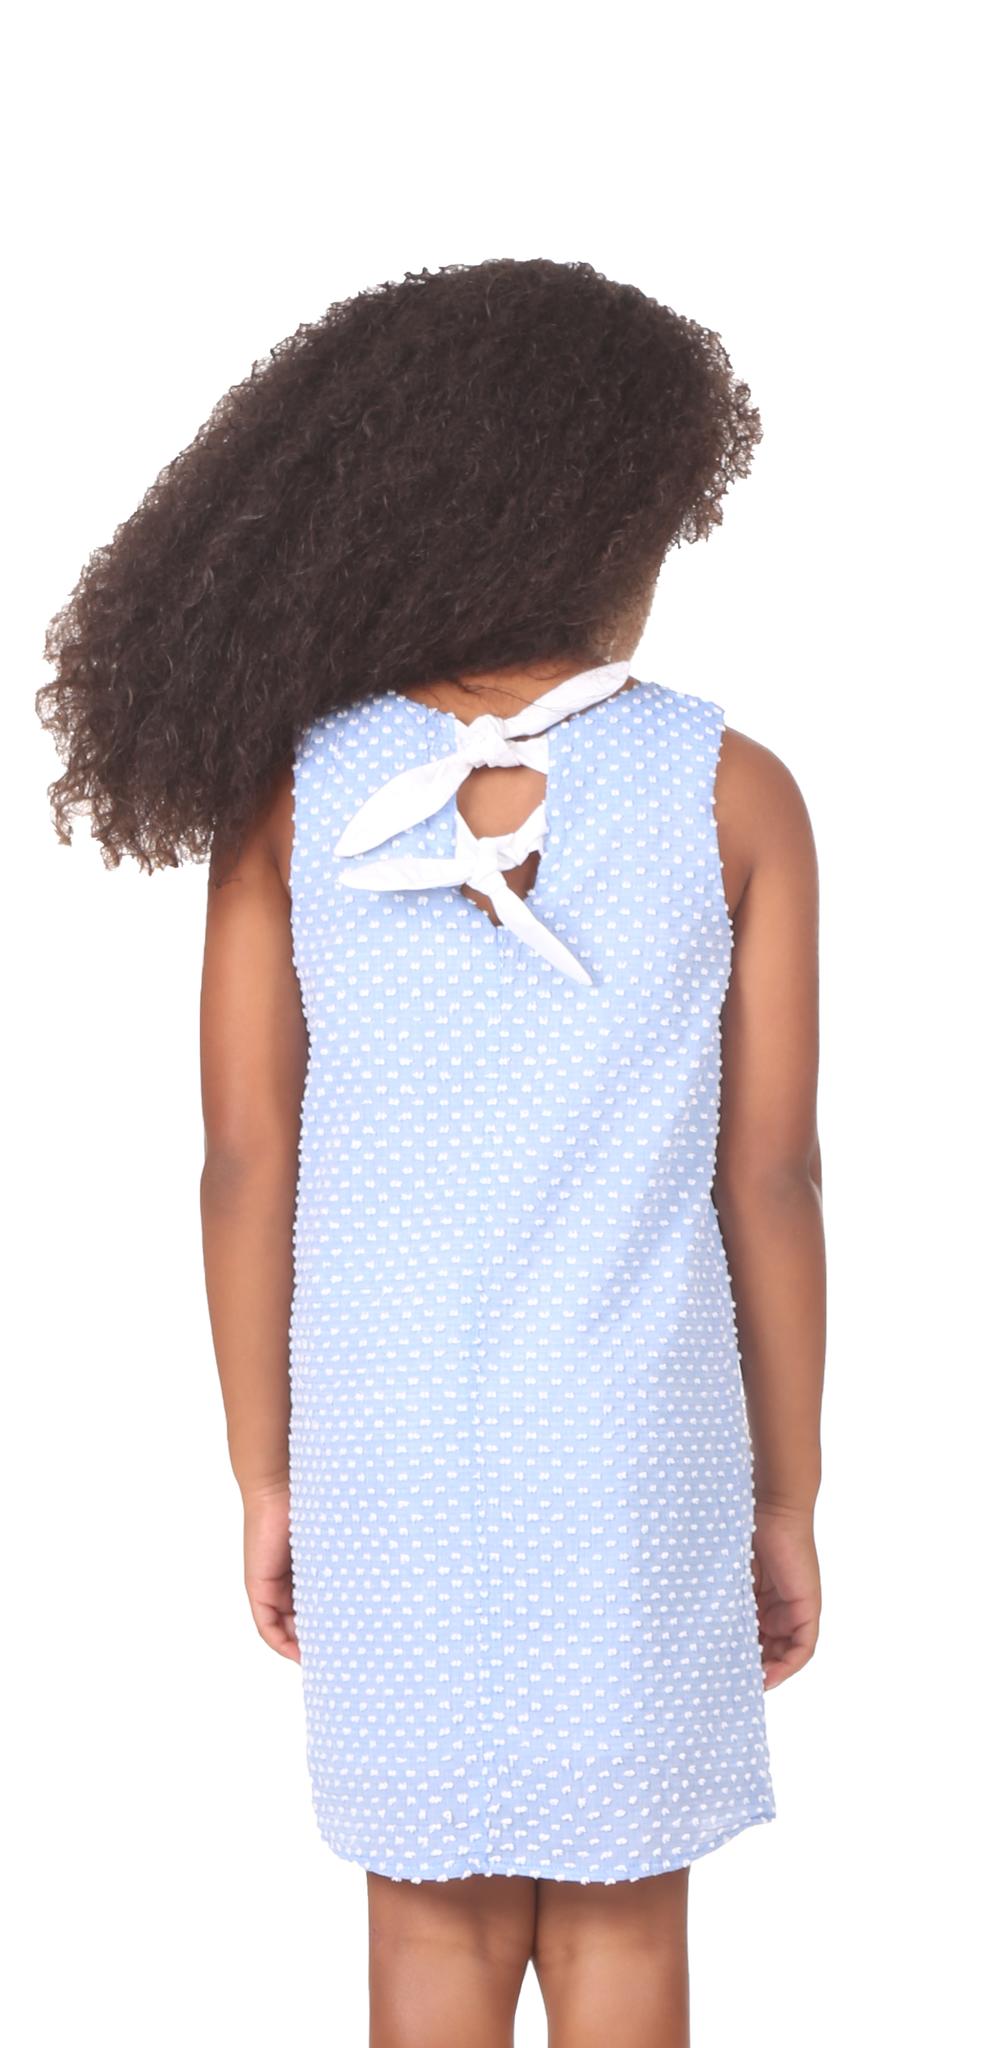 Duffield Lane Teza Tie Back Dress